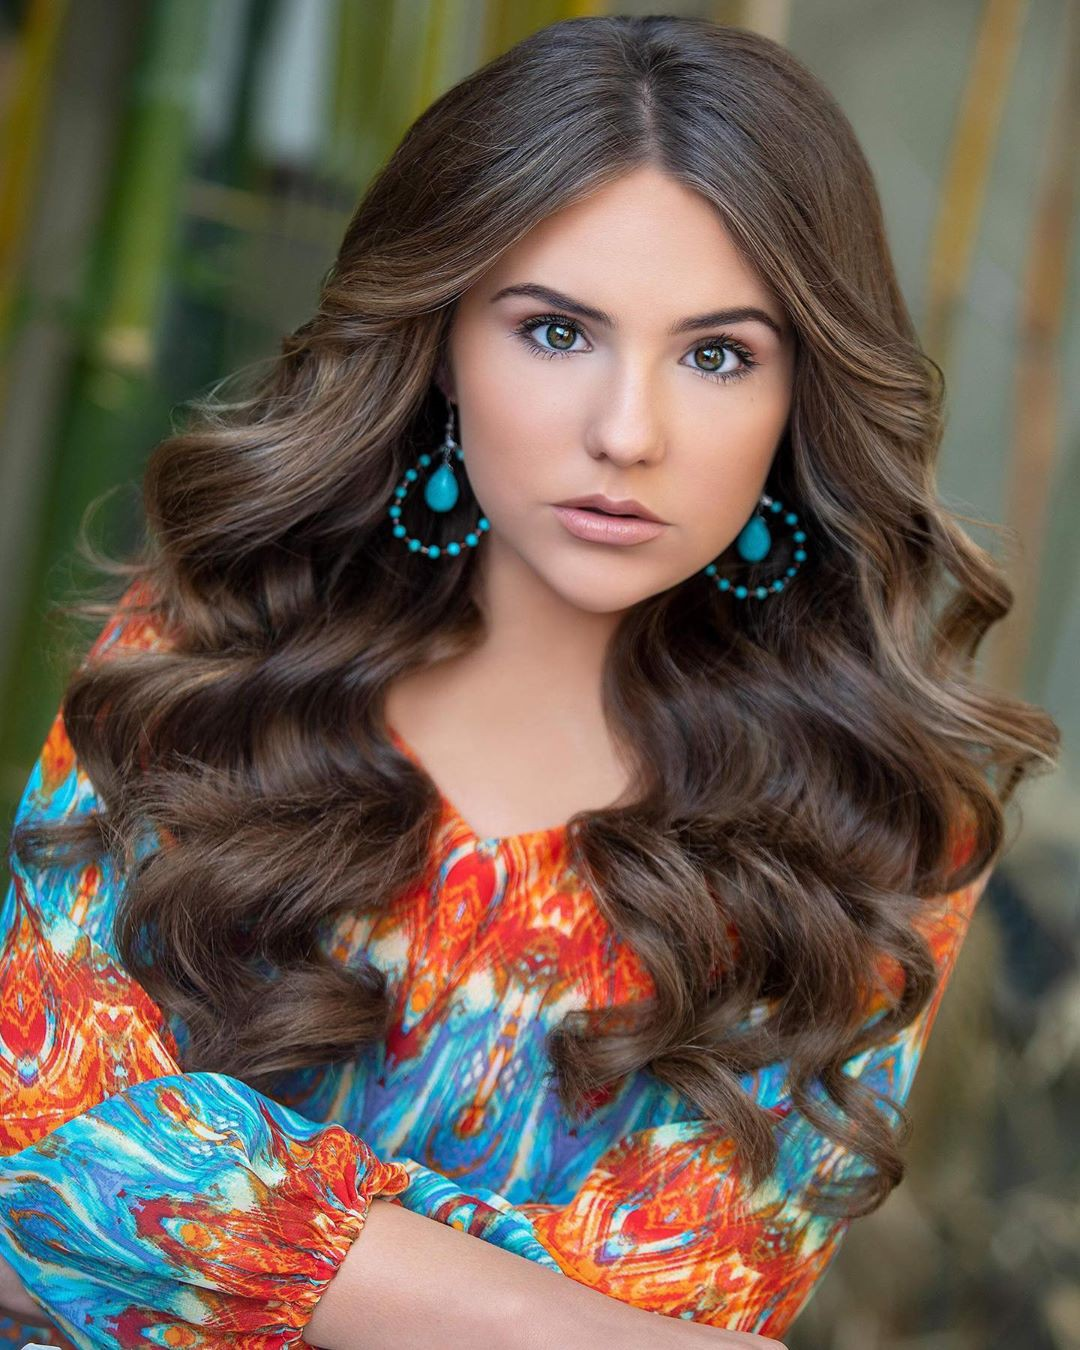 Piper Rockelle girls photoshoot, Pretty Look, Long Layered Hair